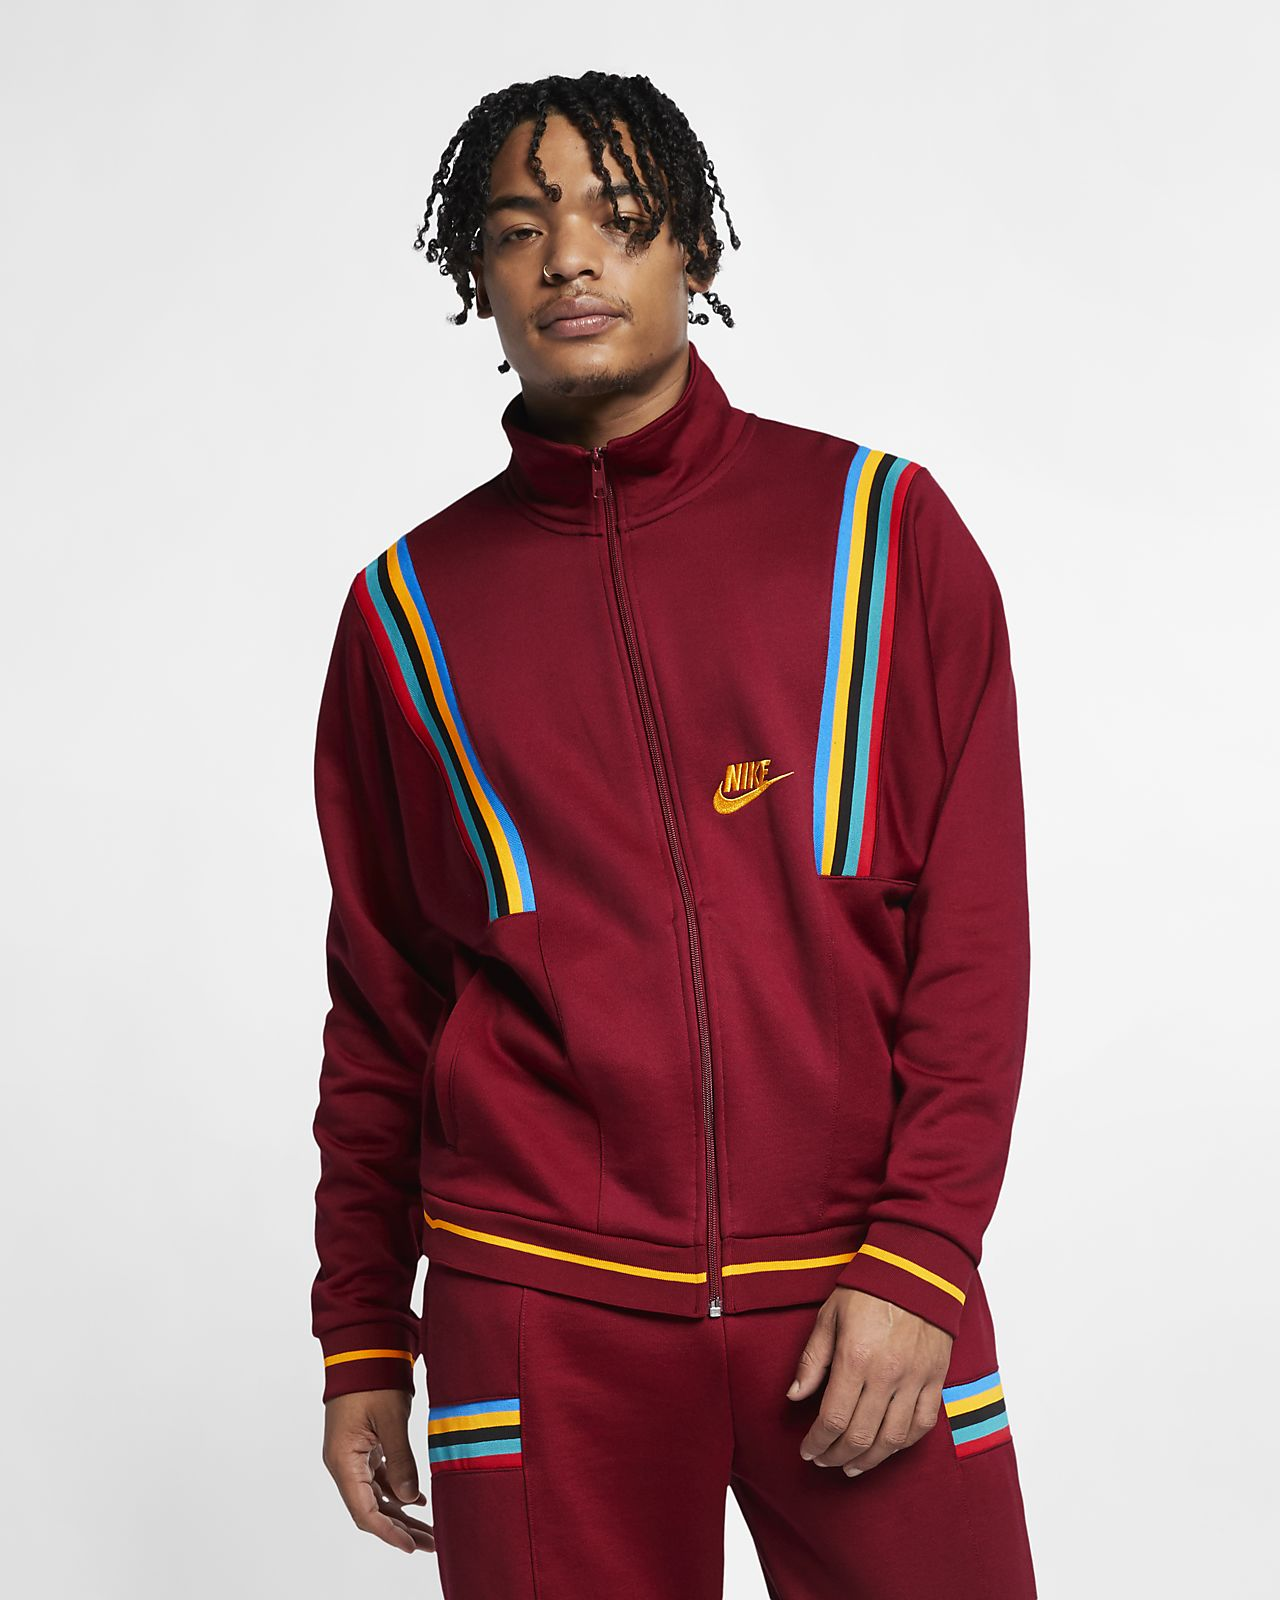 Nike Sportswear French Terry 男子夹克